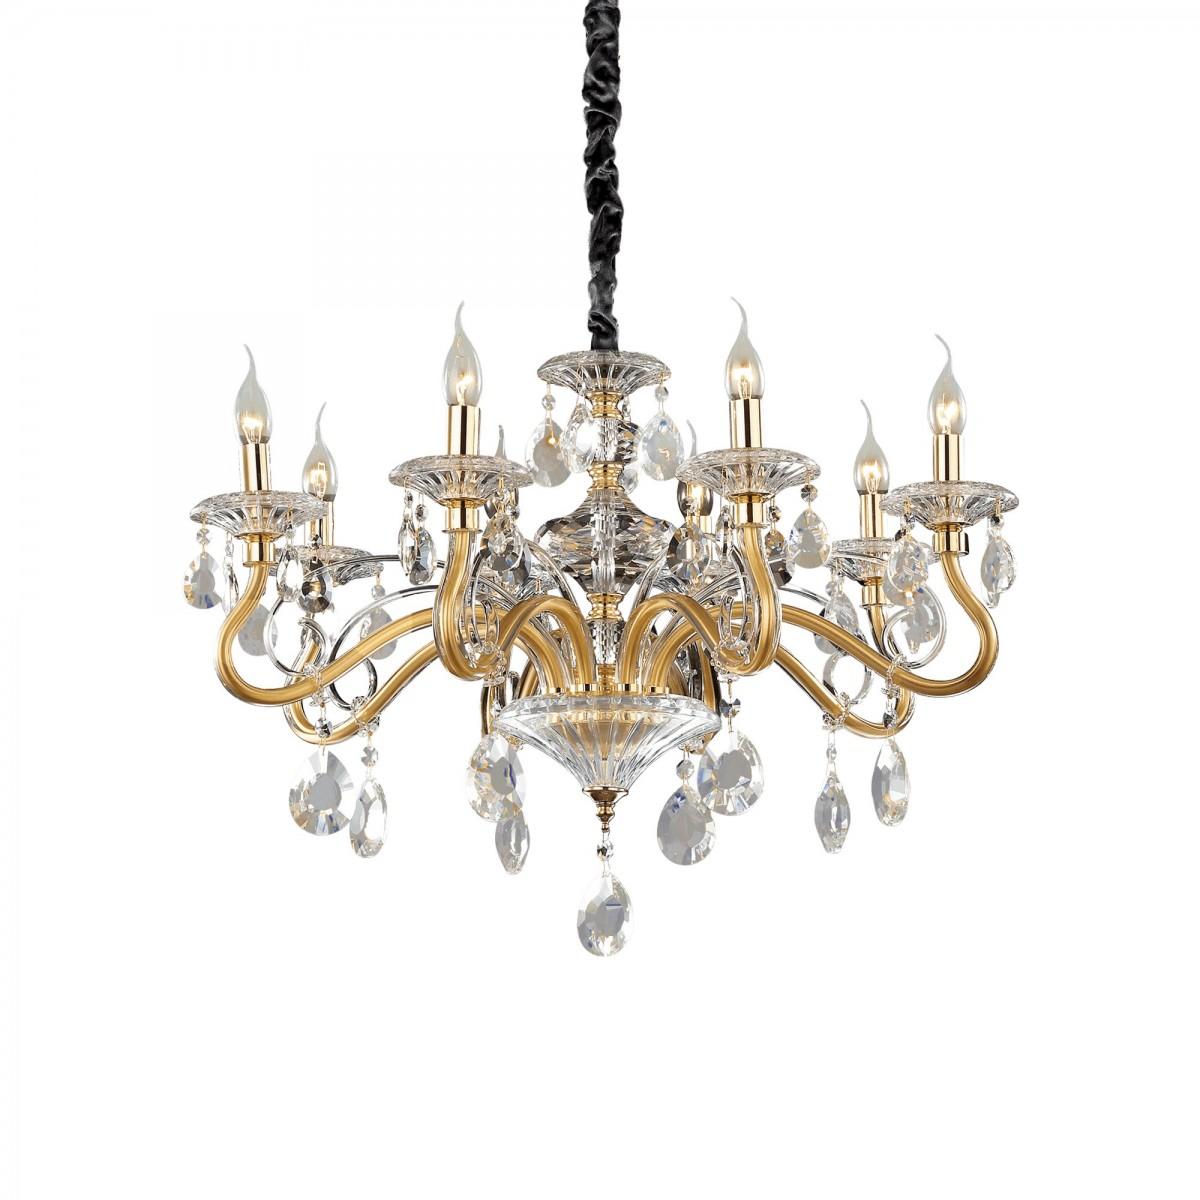 závěsné svítidlo lustr Ideal lux Negresco SP8 141053 8x40W E14 - dekorativní luxus